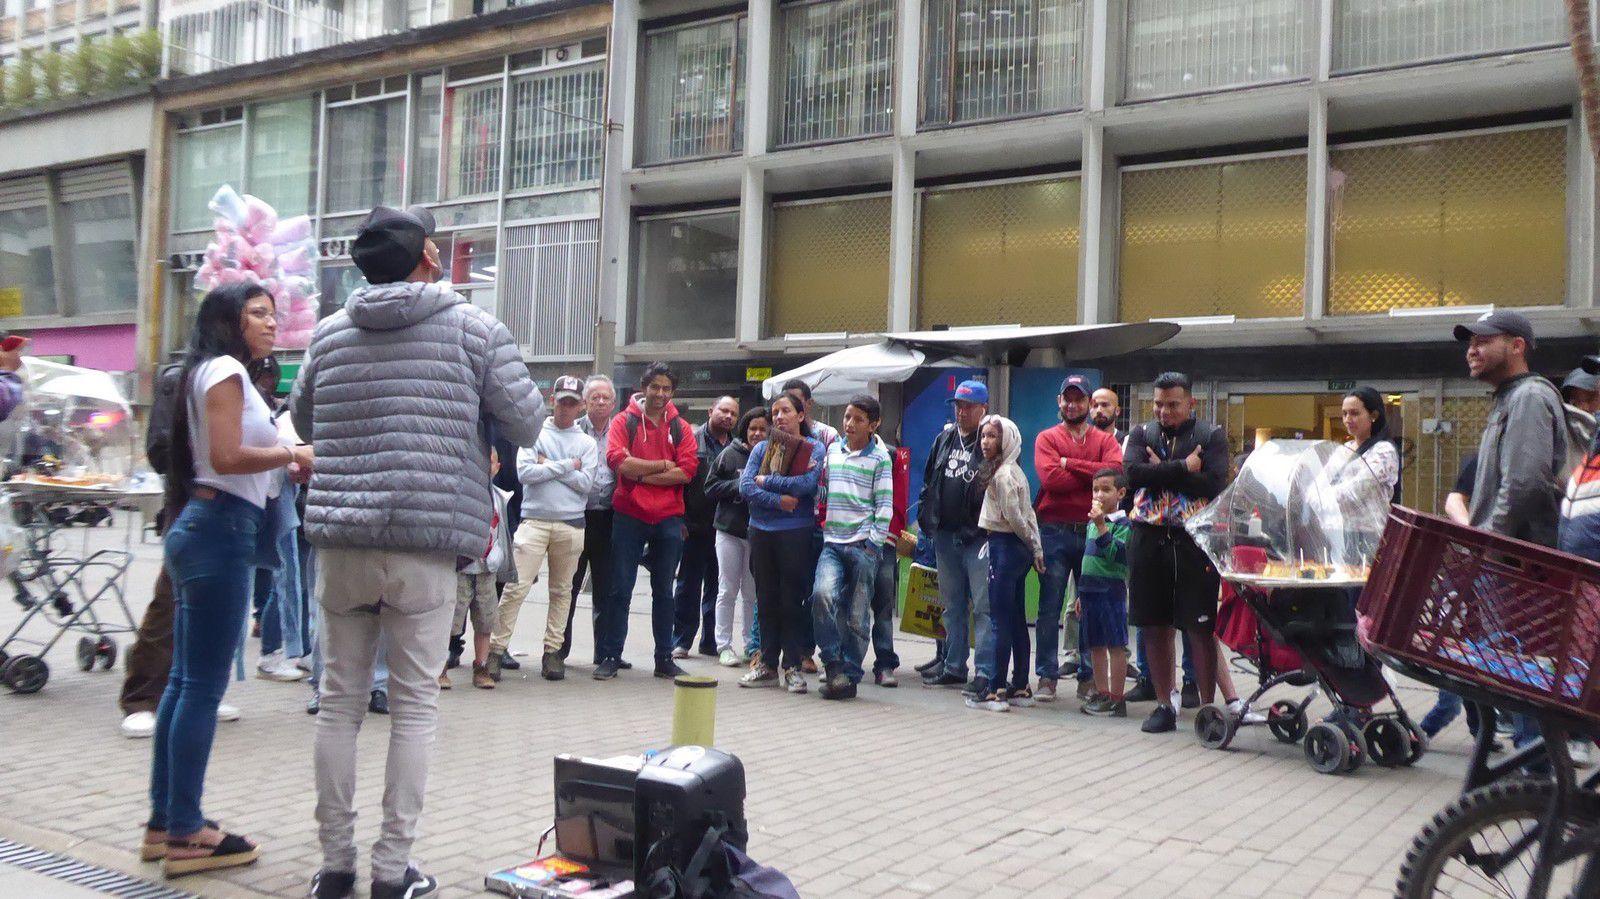 J42 - Mercredi 29 Janvier 2020 - Dernier jour à Bogota